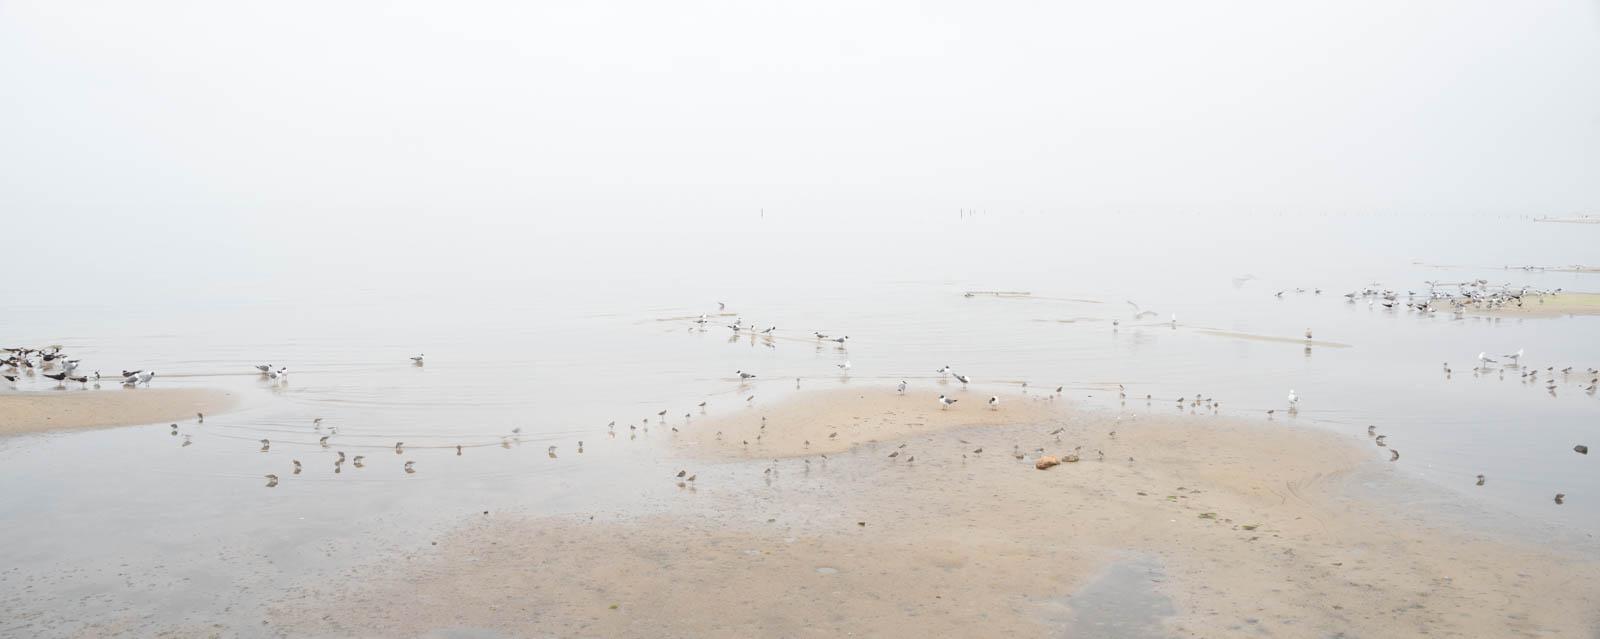 mississippi_coast_birds01